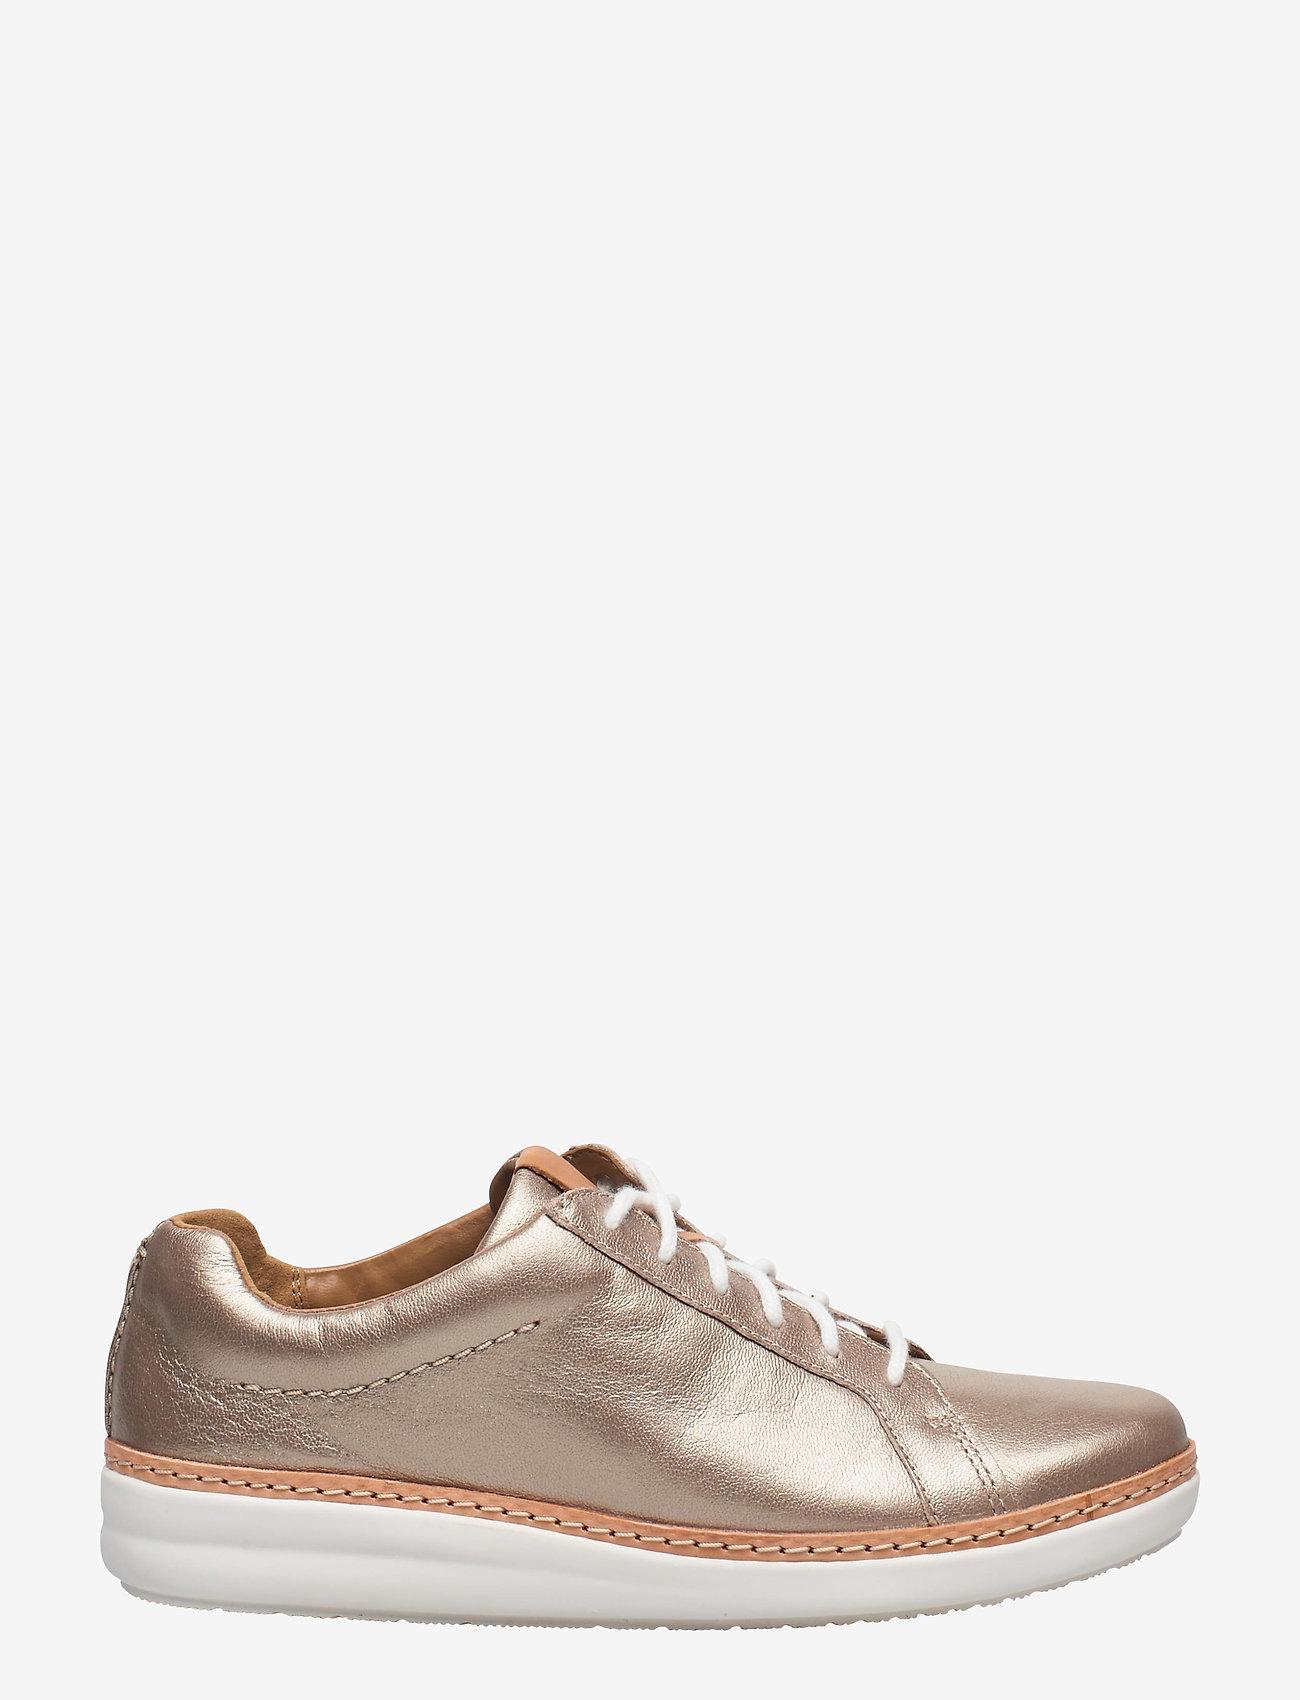 Clarks - Amberlee Rosa - lage sneakers - gold metallic - 1